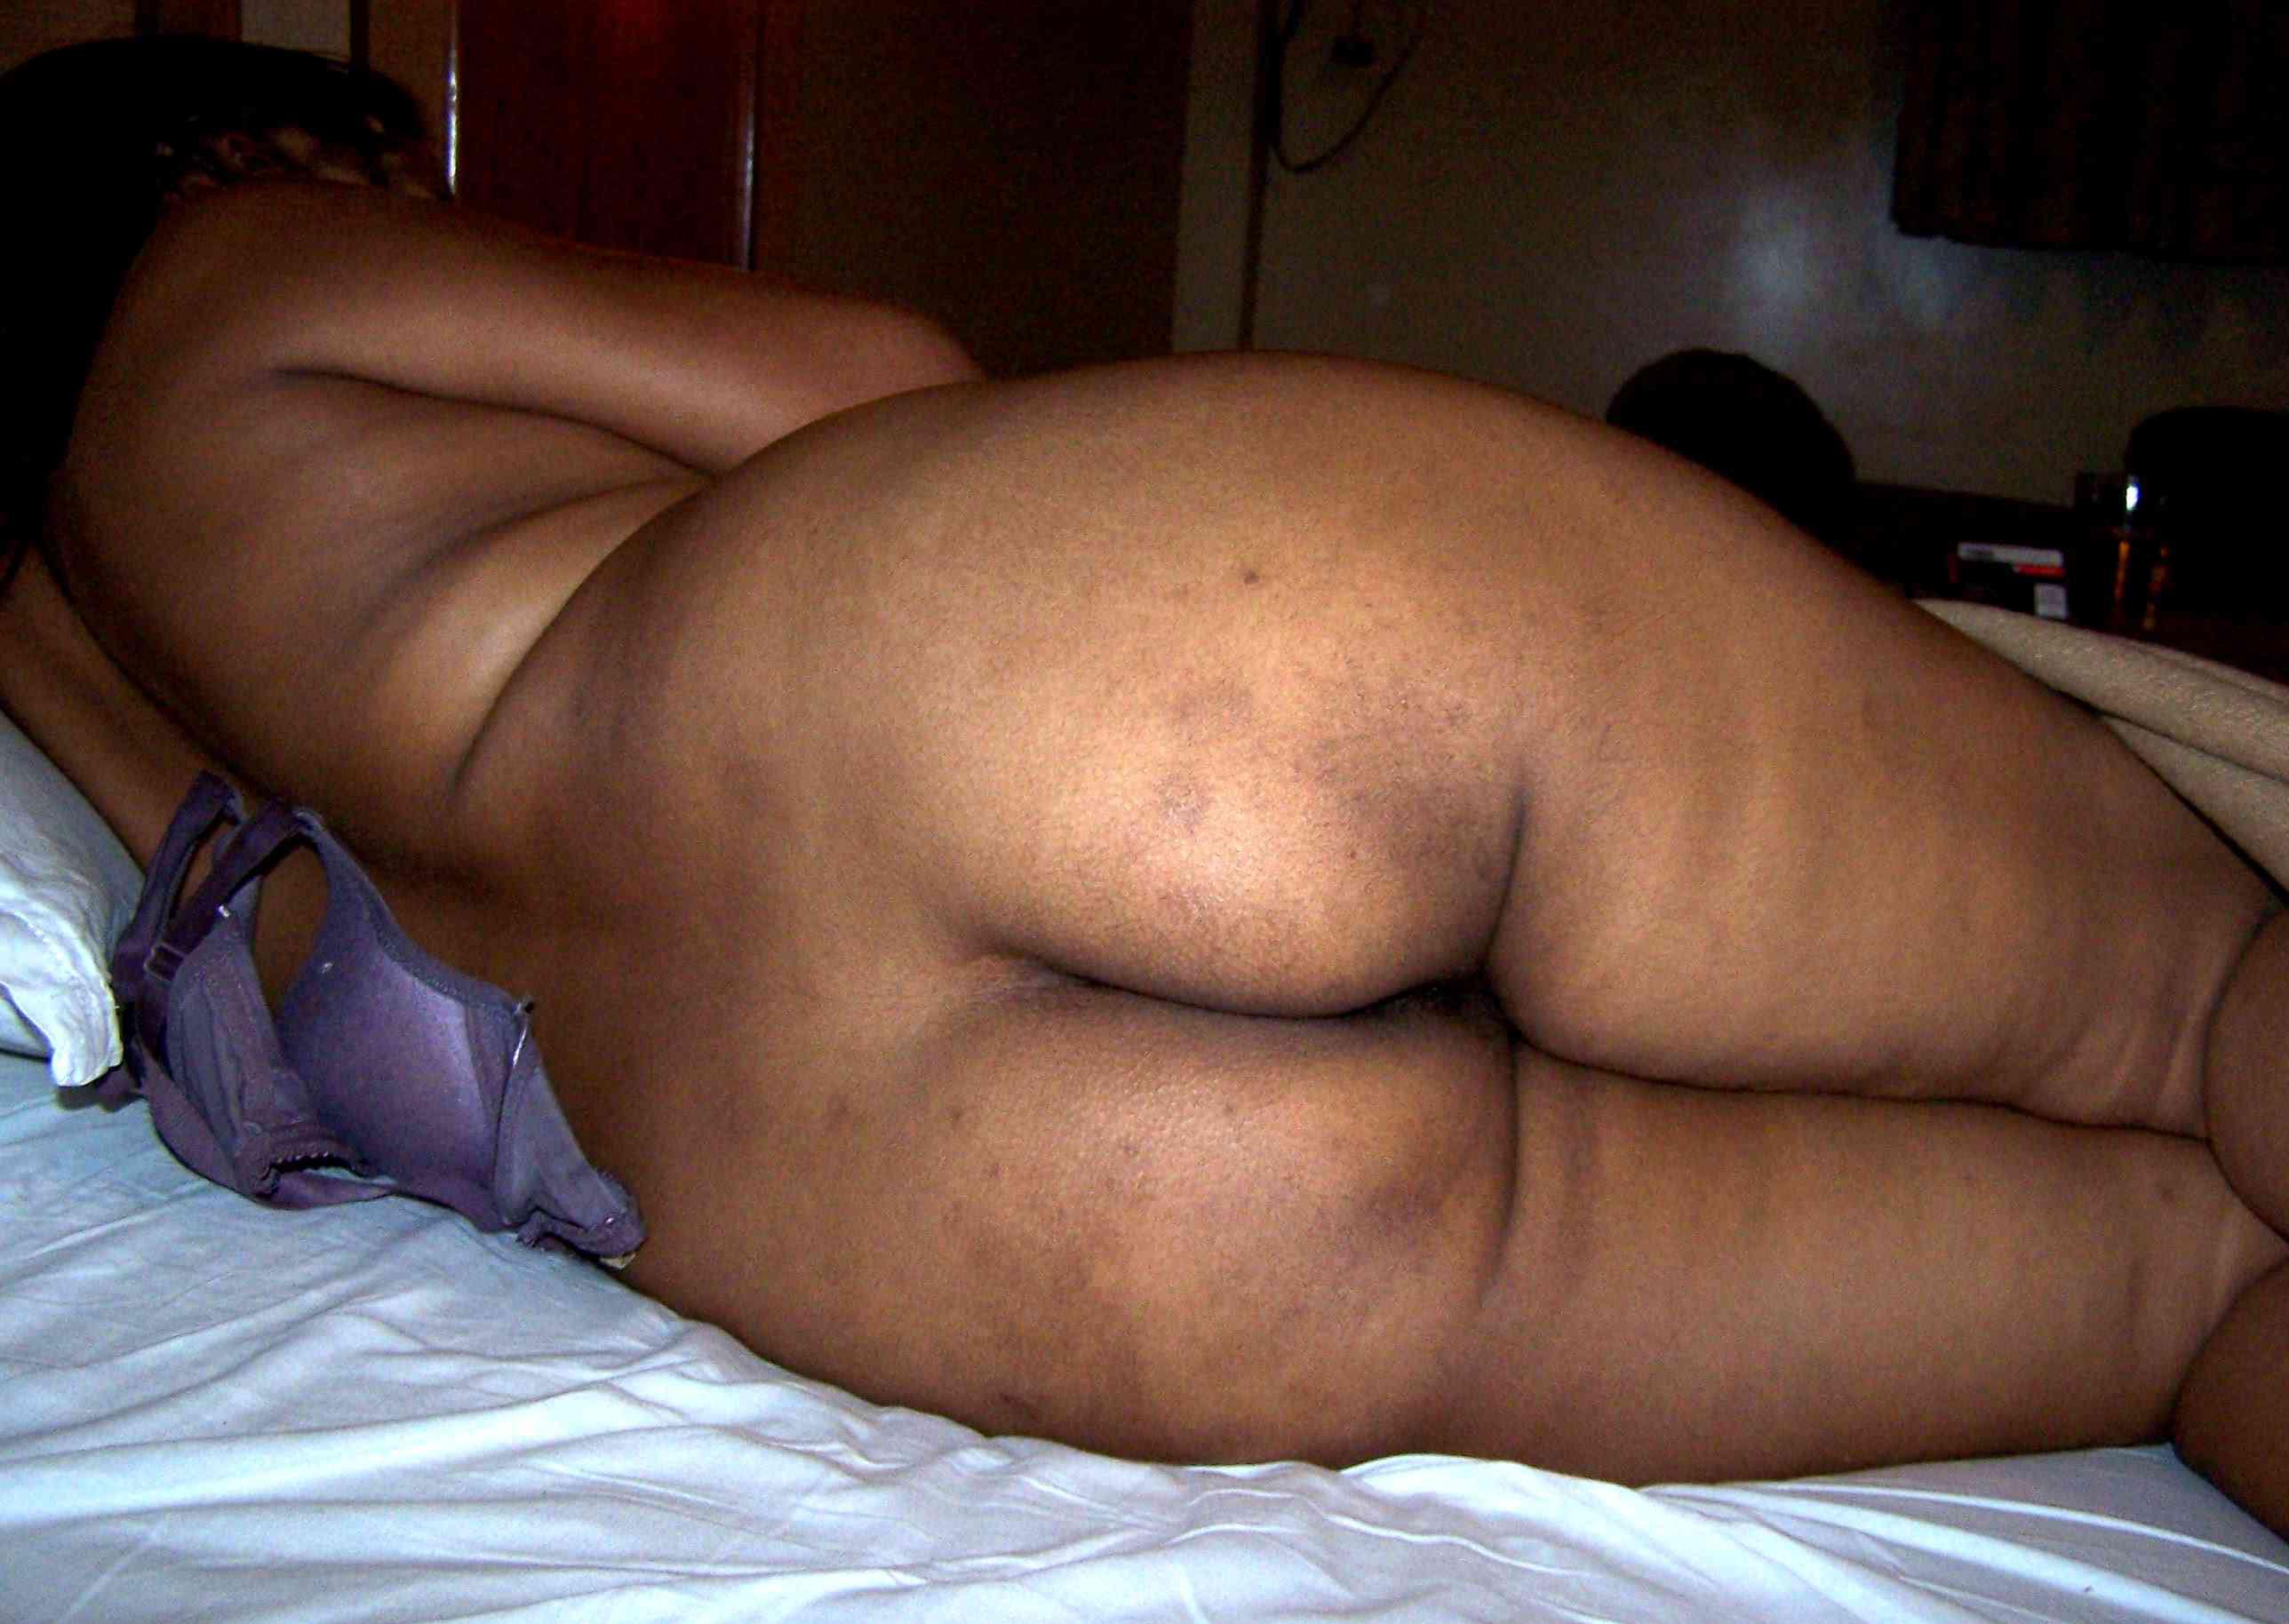 Bhabhi big ass nude